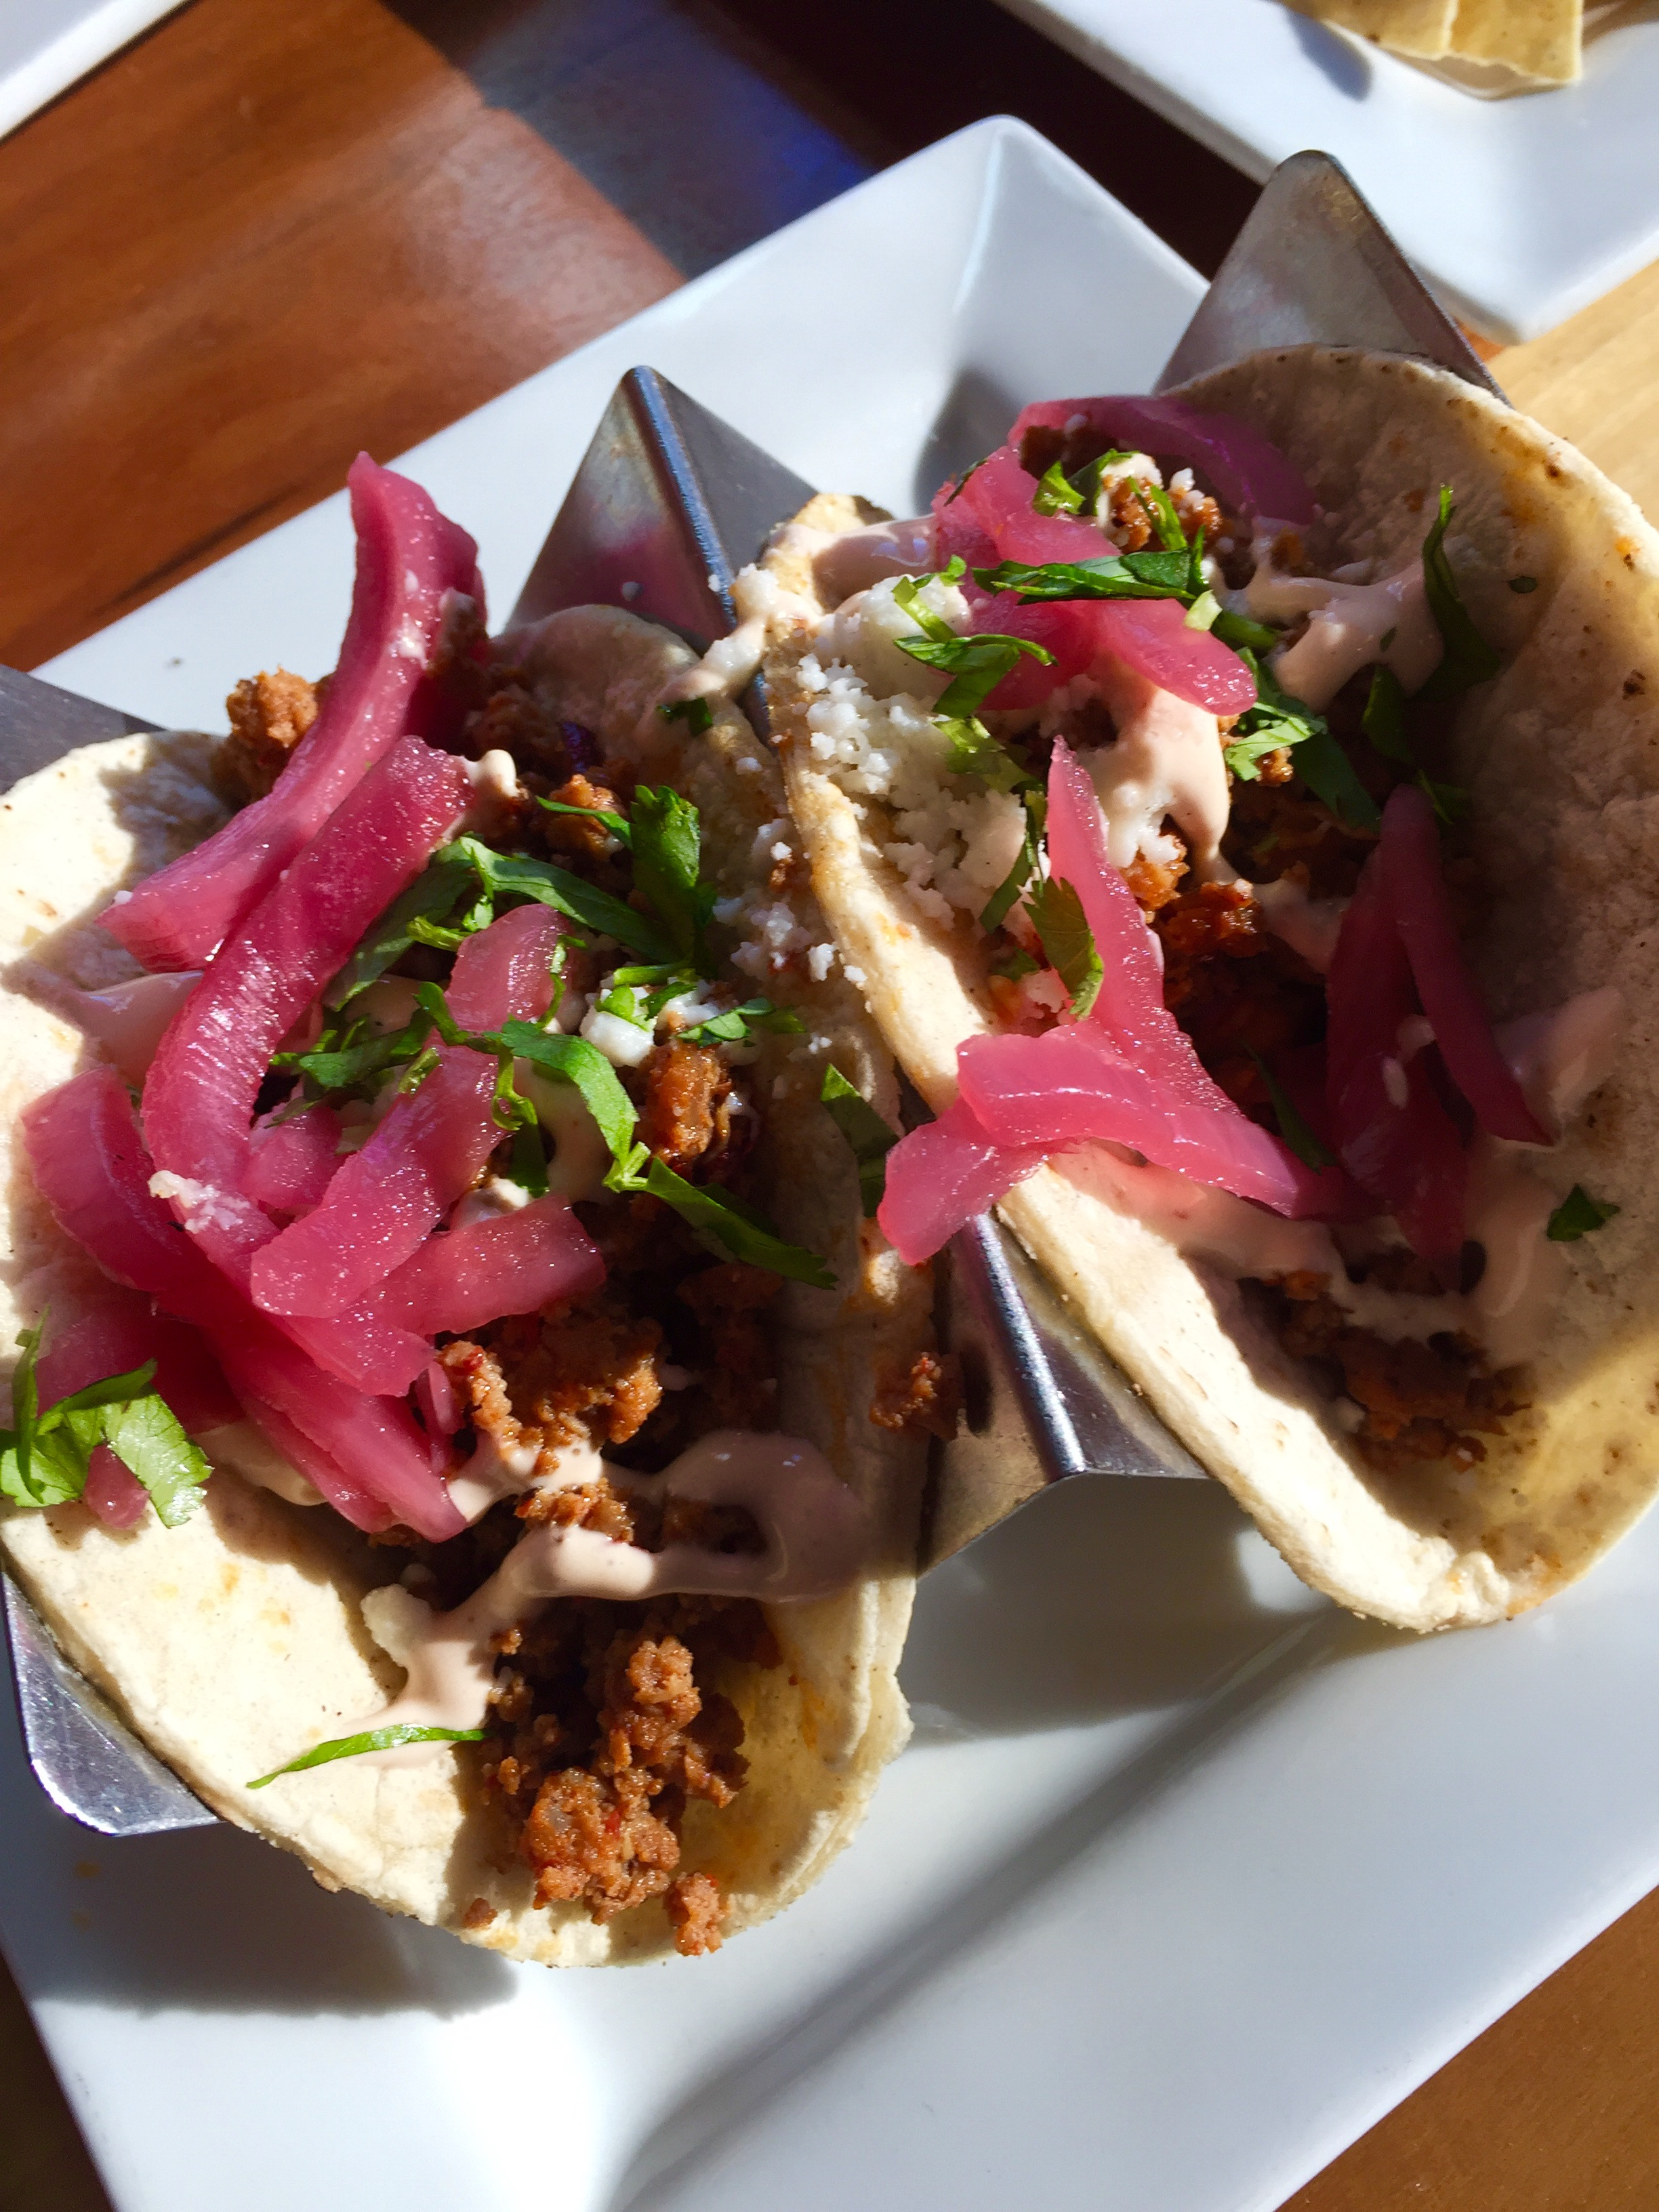 Turkey chorizo tacos from  Taqueria 27 in SLC. I go here way too much.